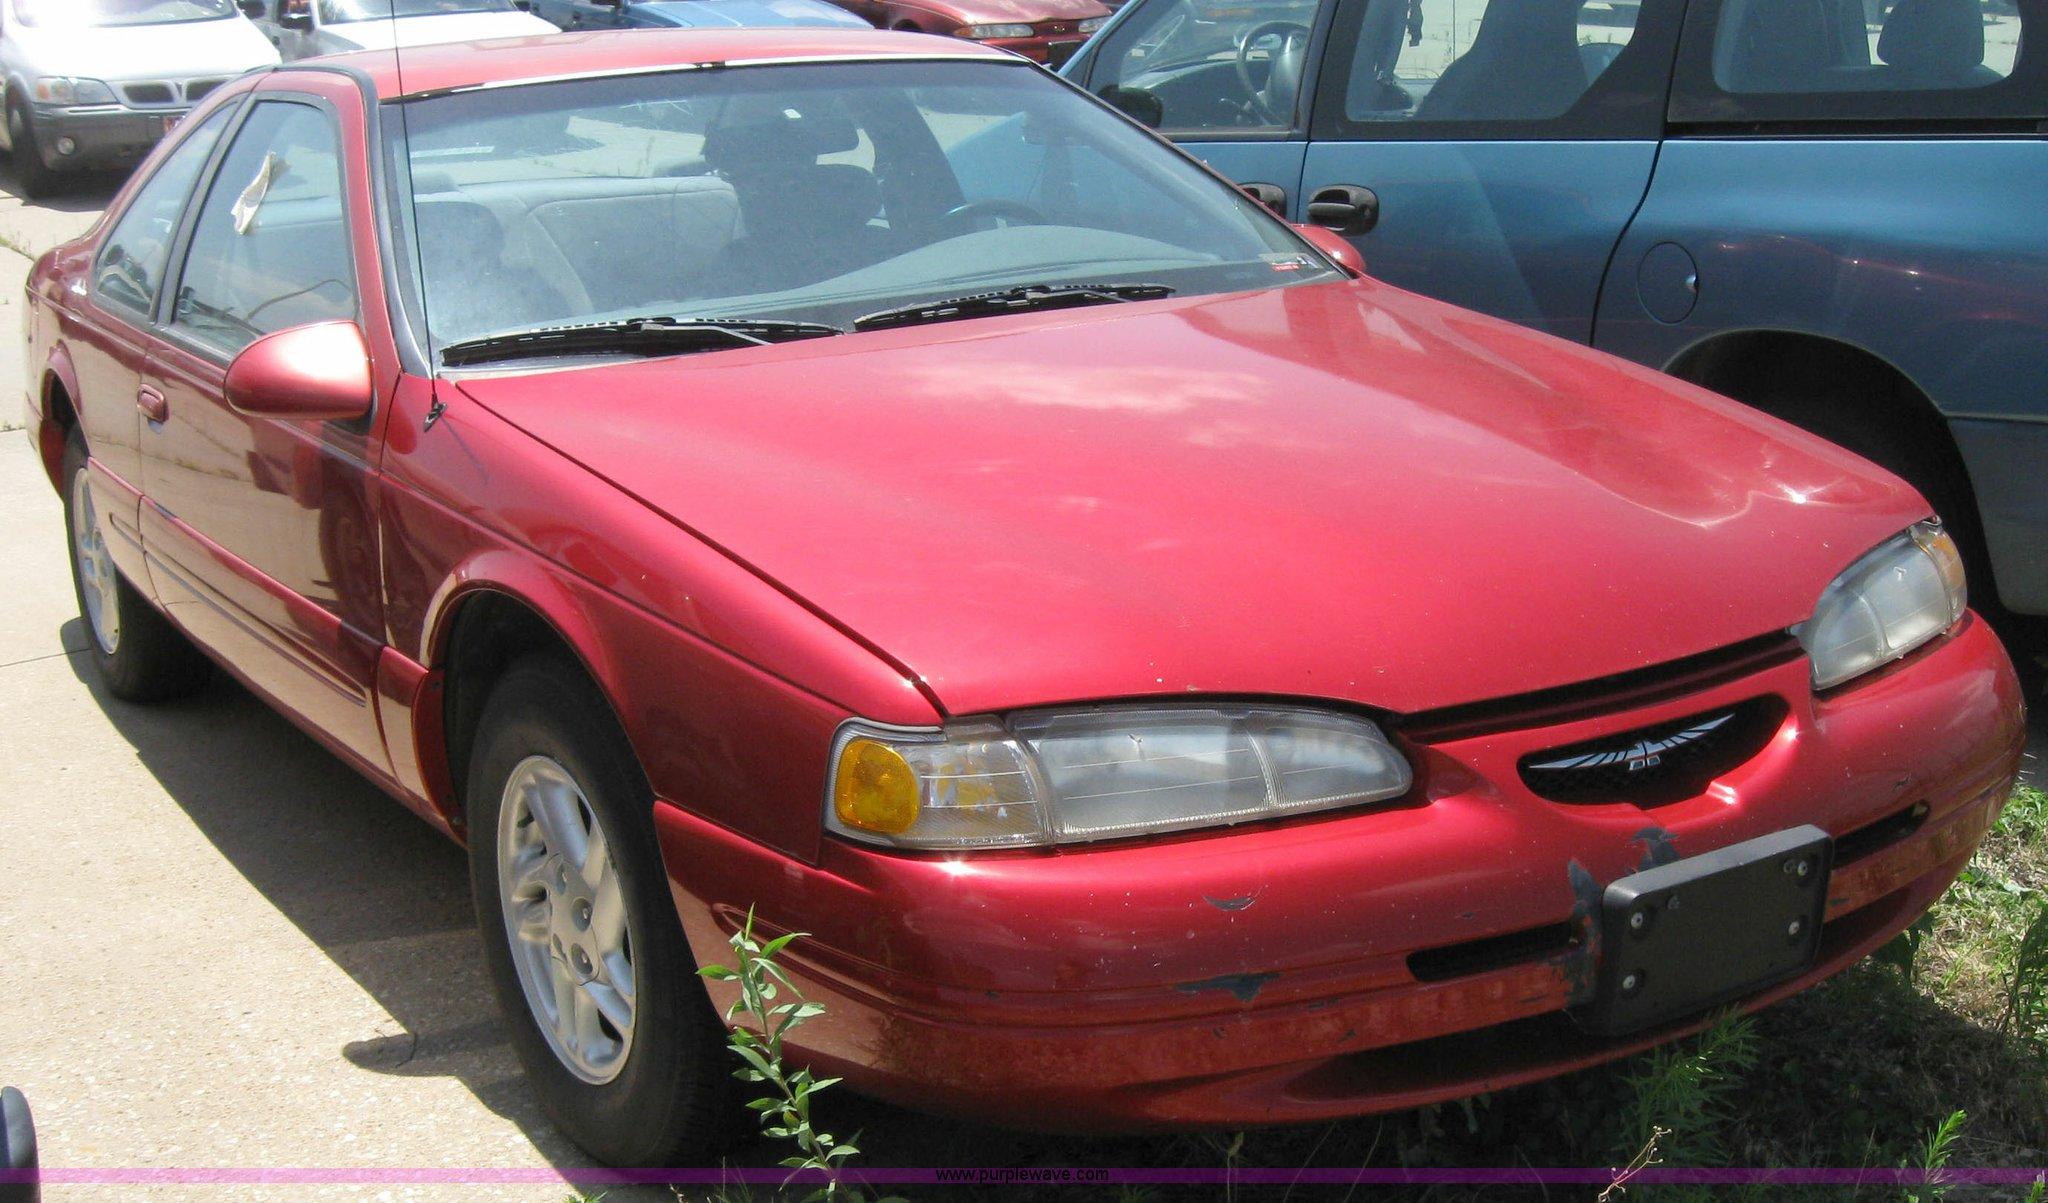 1996 Ford Thunderbird Lx 4 6l V8 Fi Sohc 16v Item 2190 S